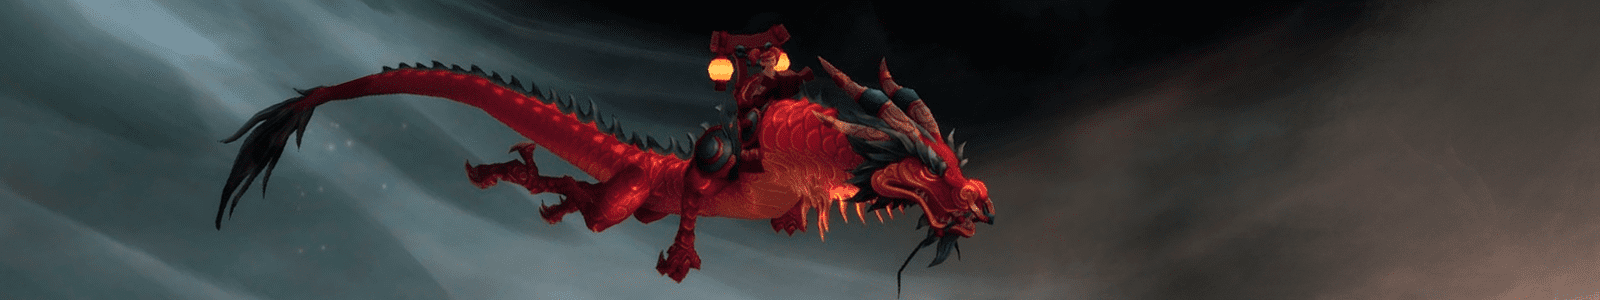 Crimson Cloud Serpent